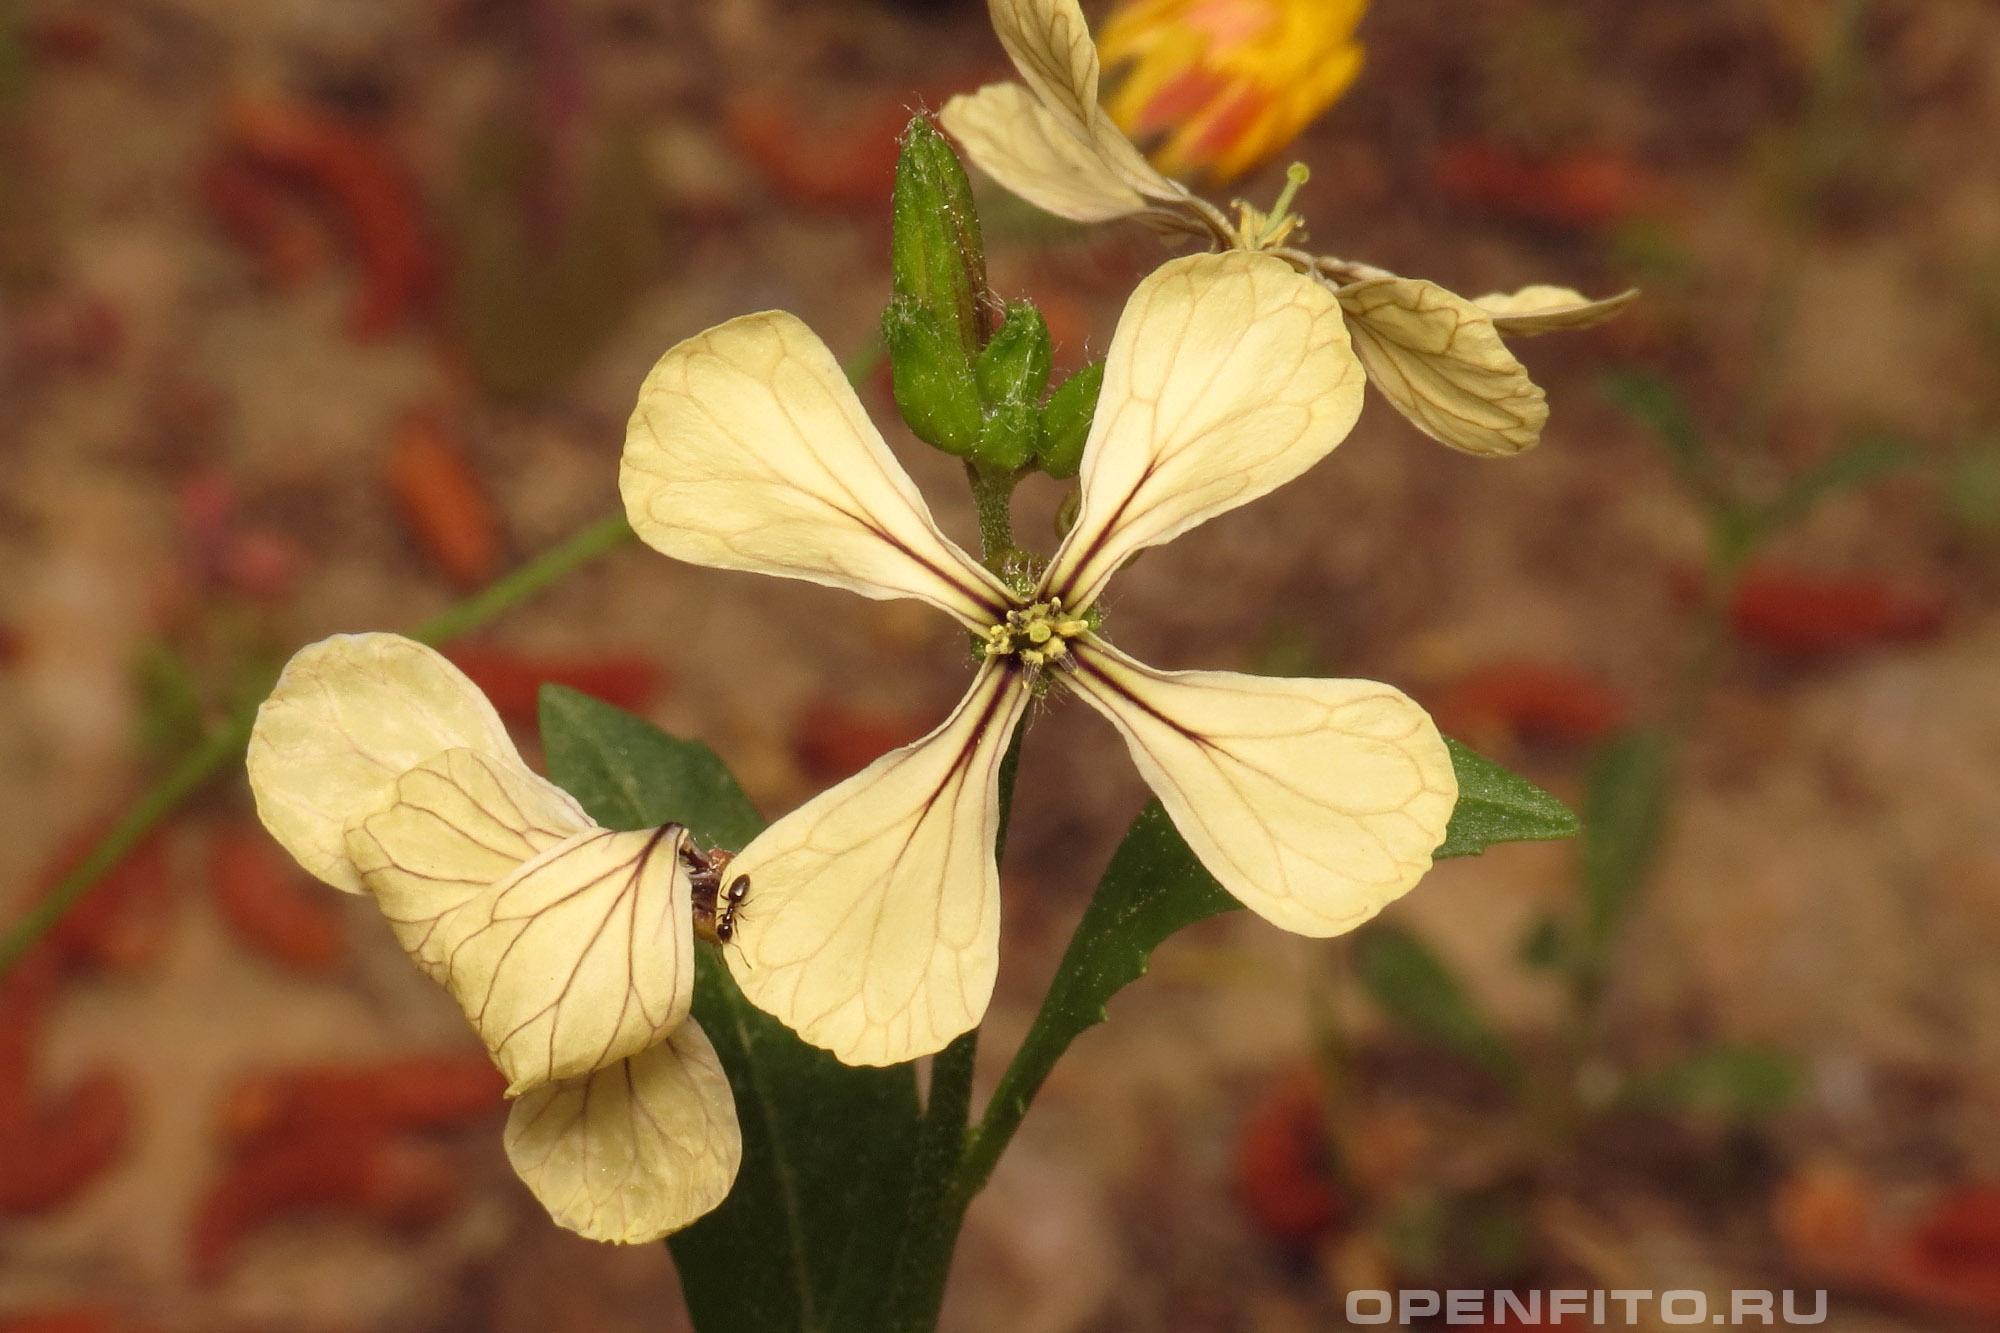 Эрука посевная желтый цветок